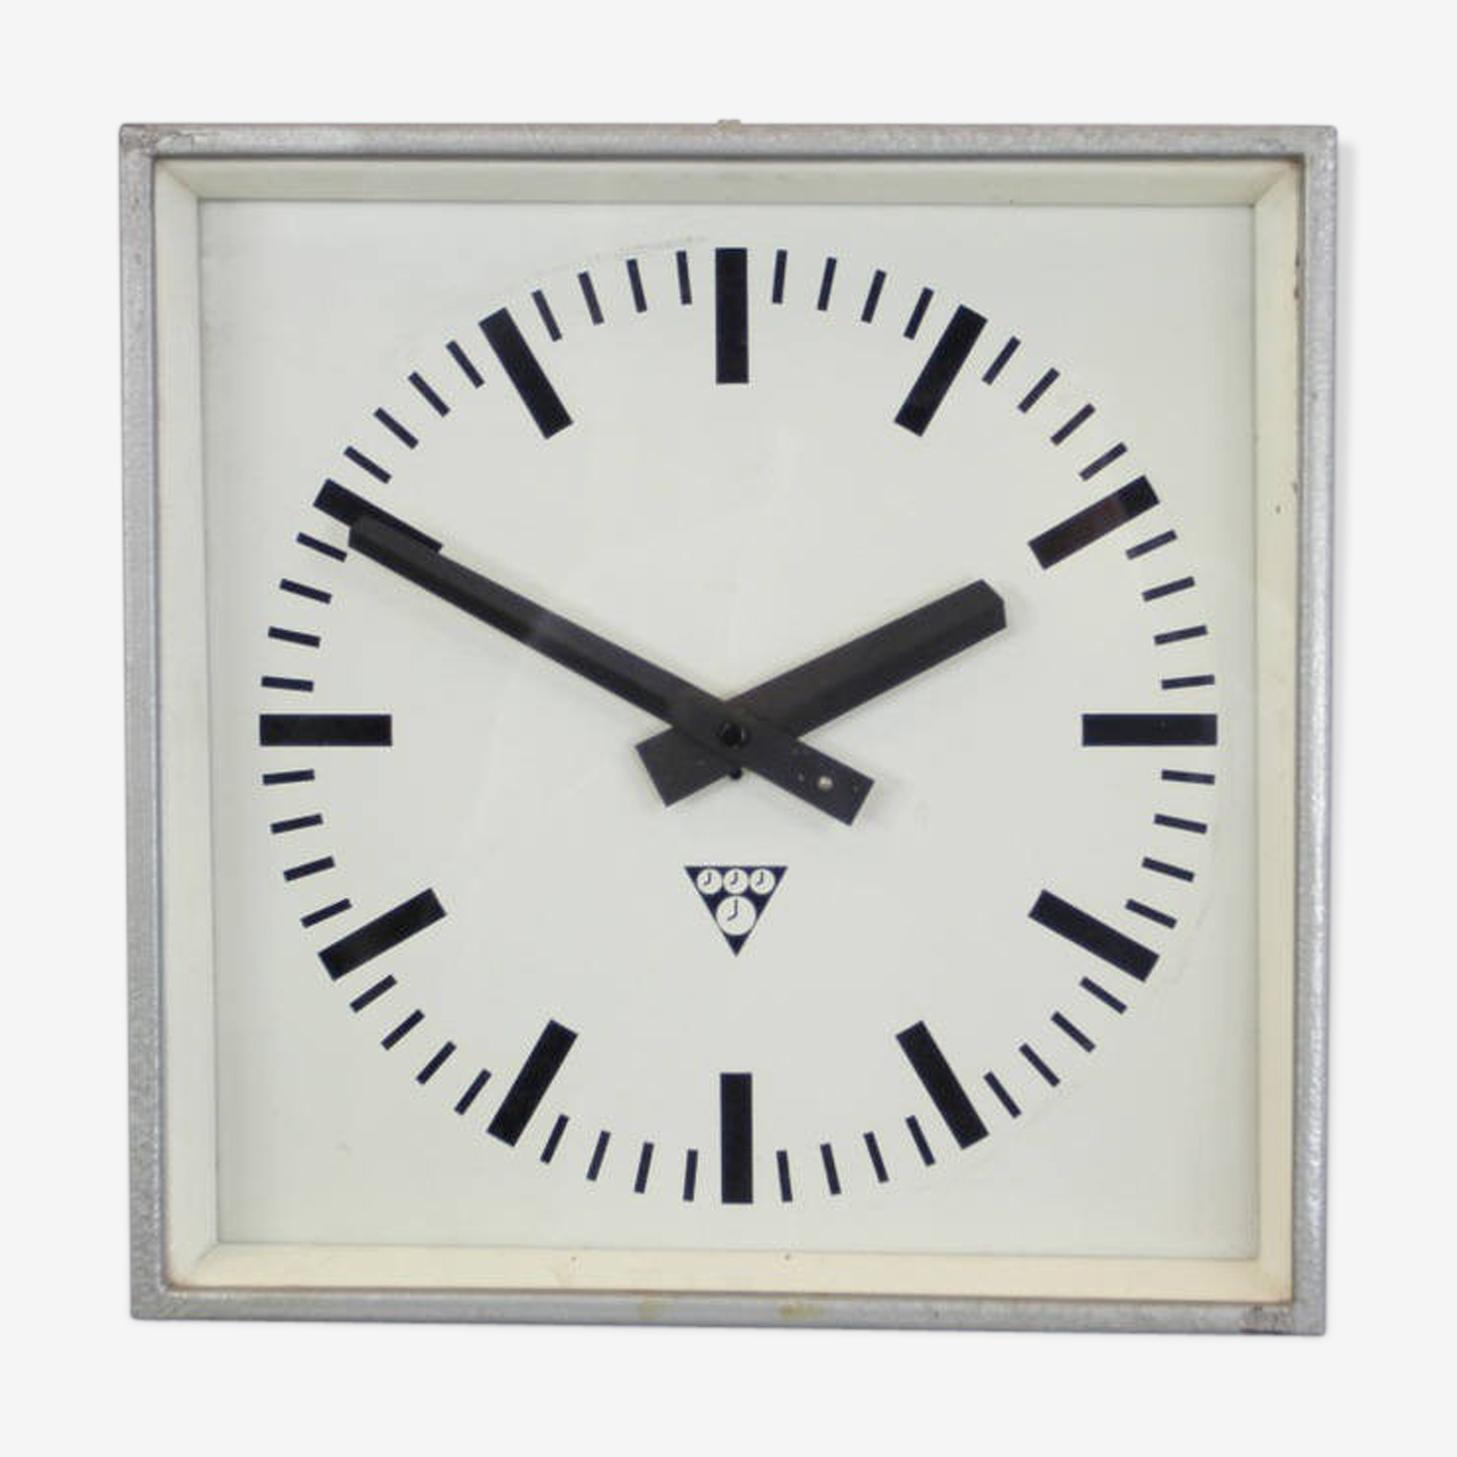 Clocks factory by Pragotron circa 1960